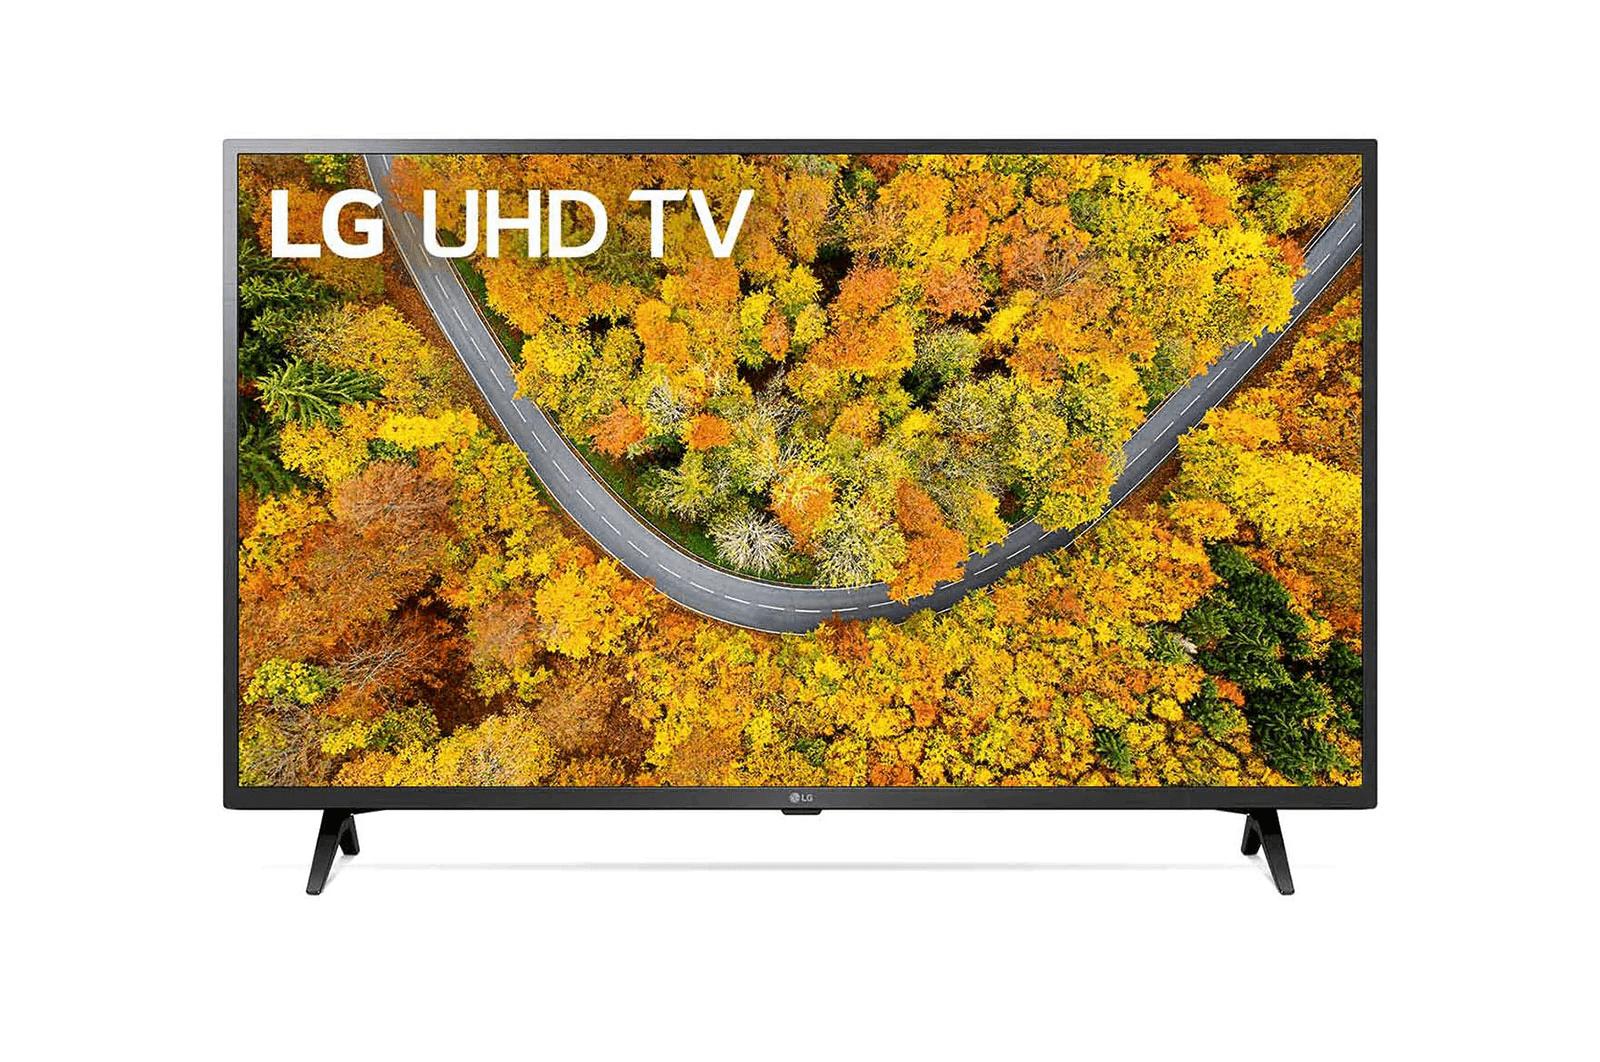 LG - LED TV 50UP7500PTC